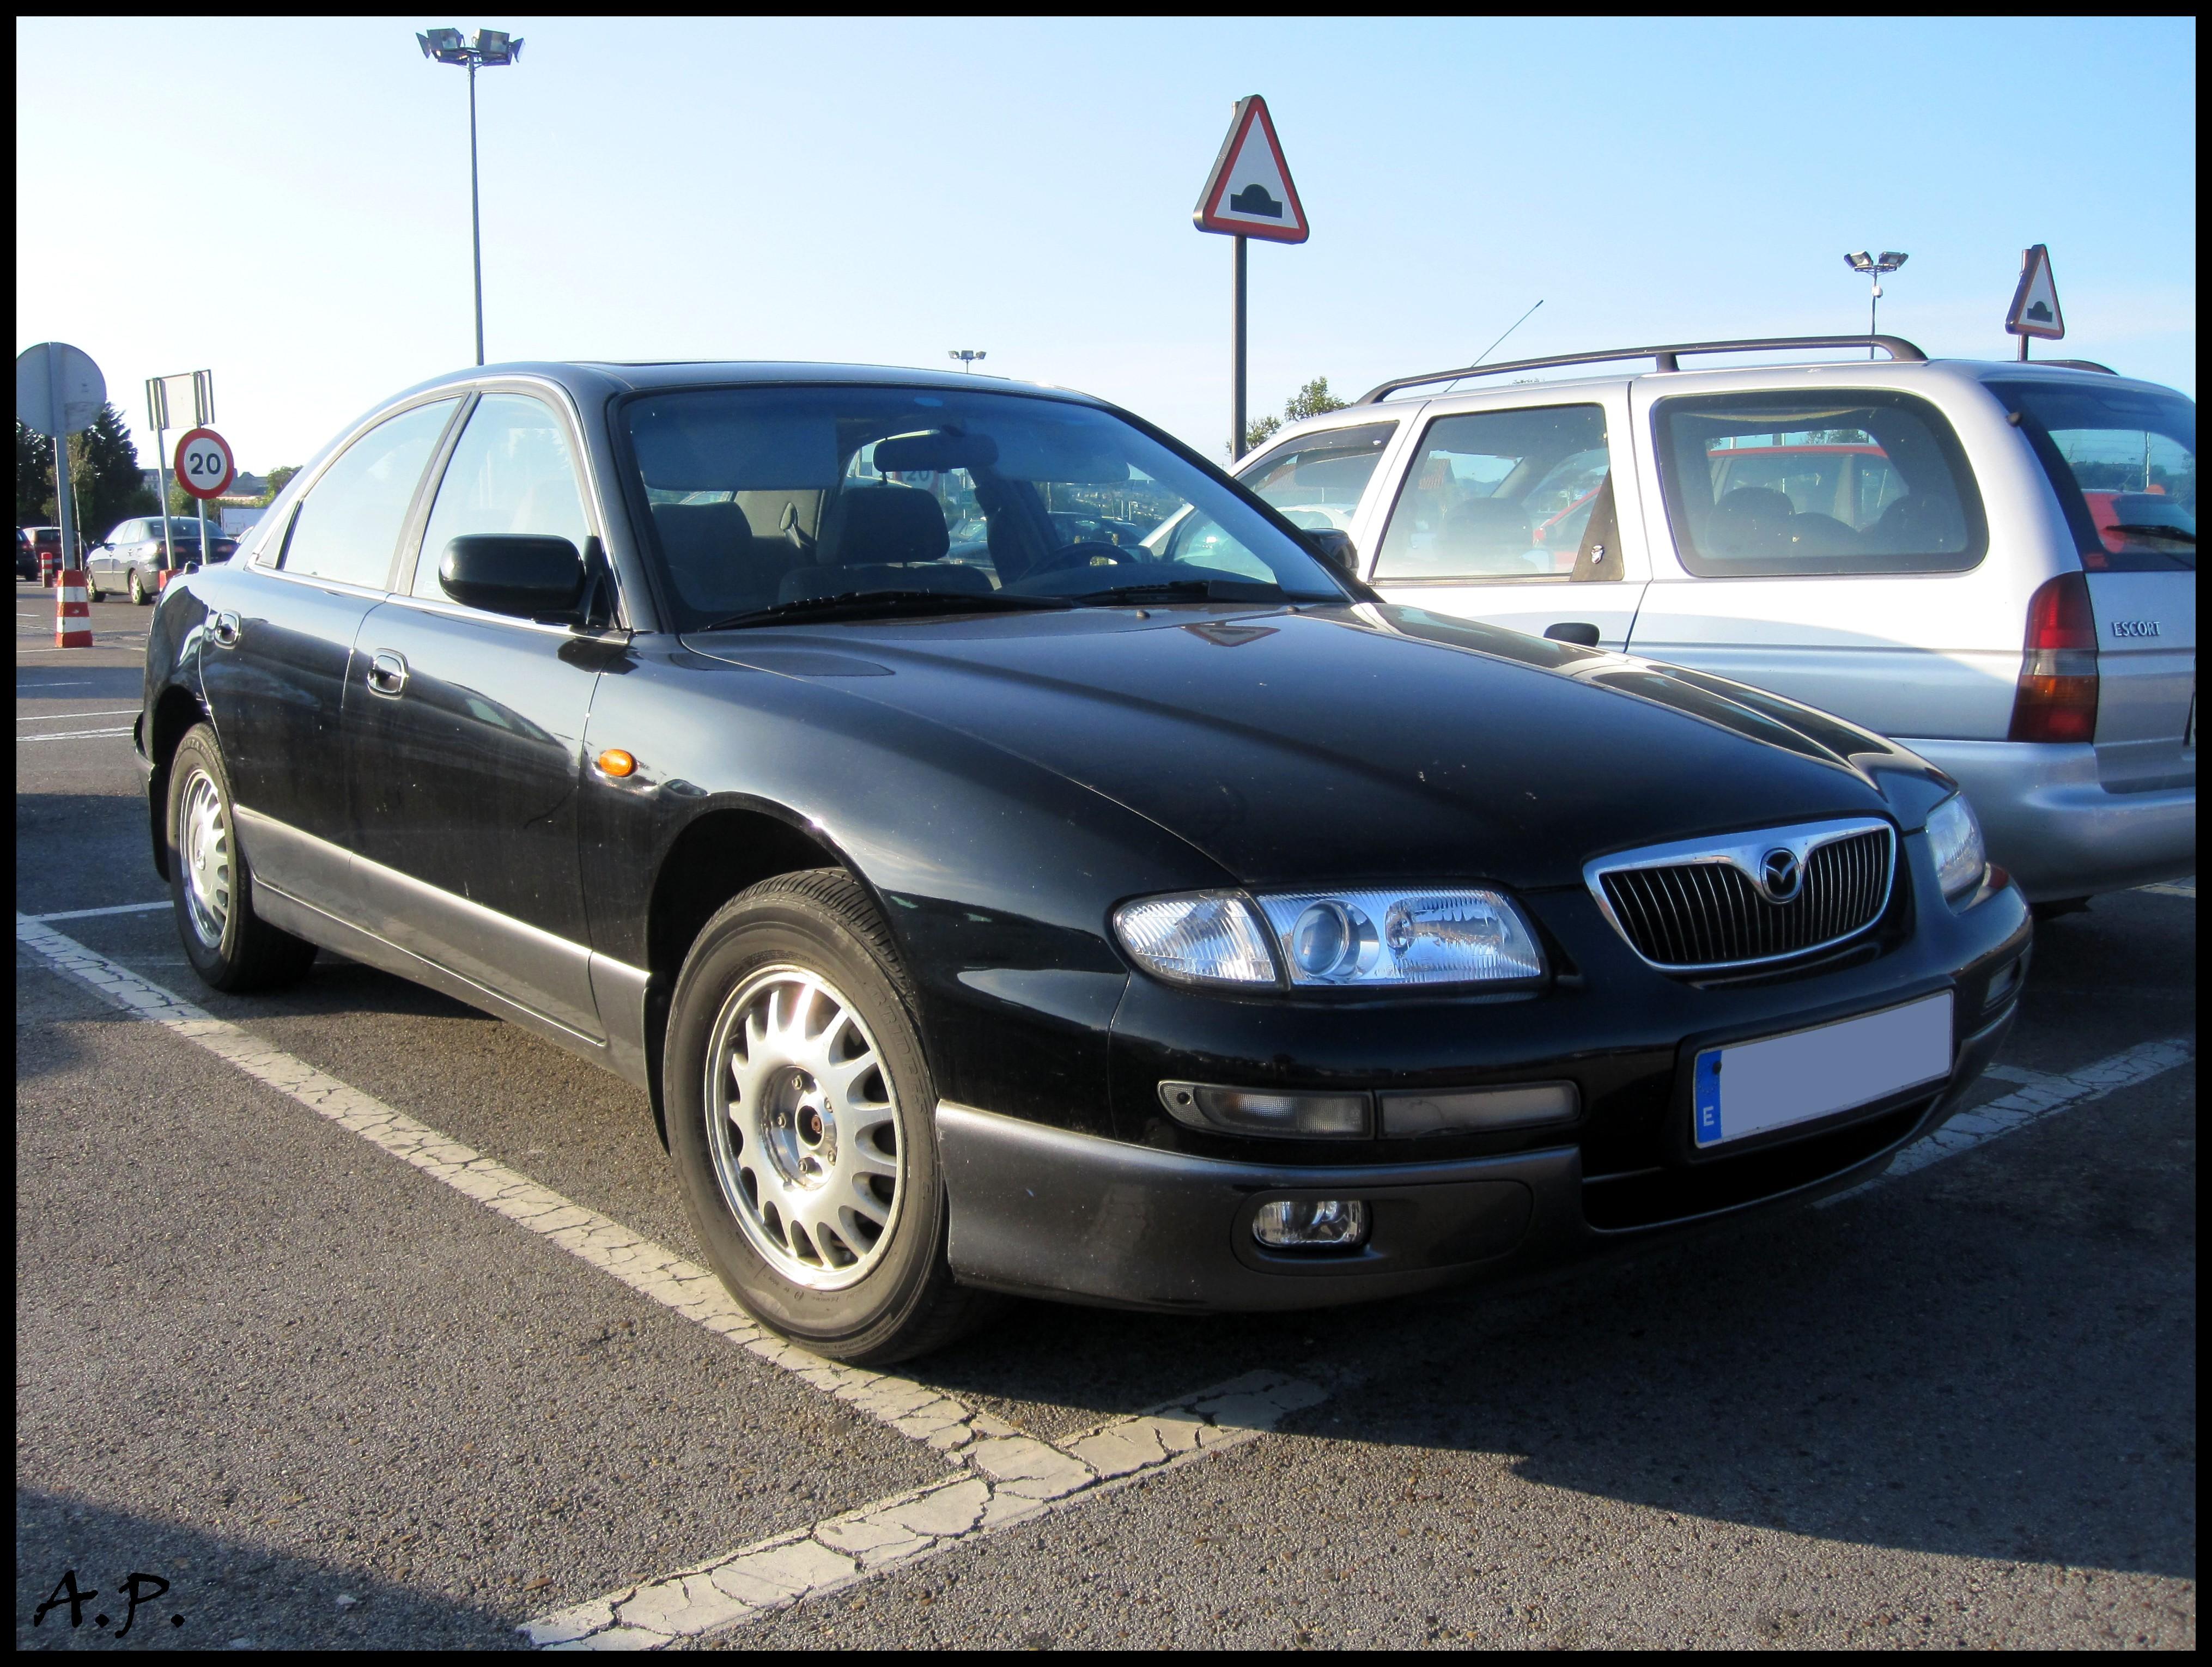 https://upload.wikimedia.org/wikipedia/commons/f/f1/2000_Mazda_Xedos_9_%284797149111%29.jpg